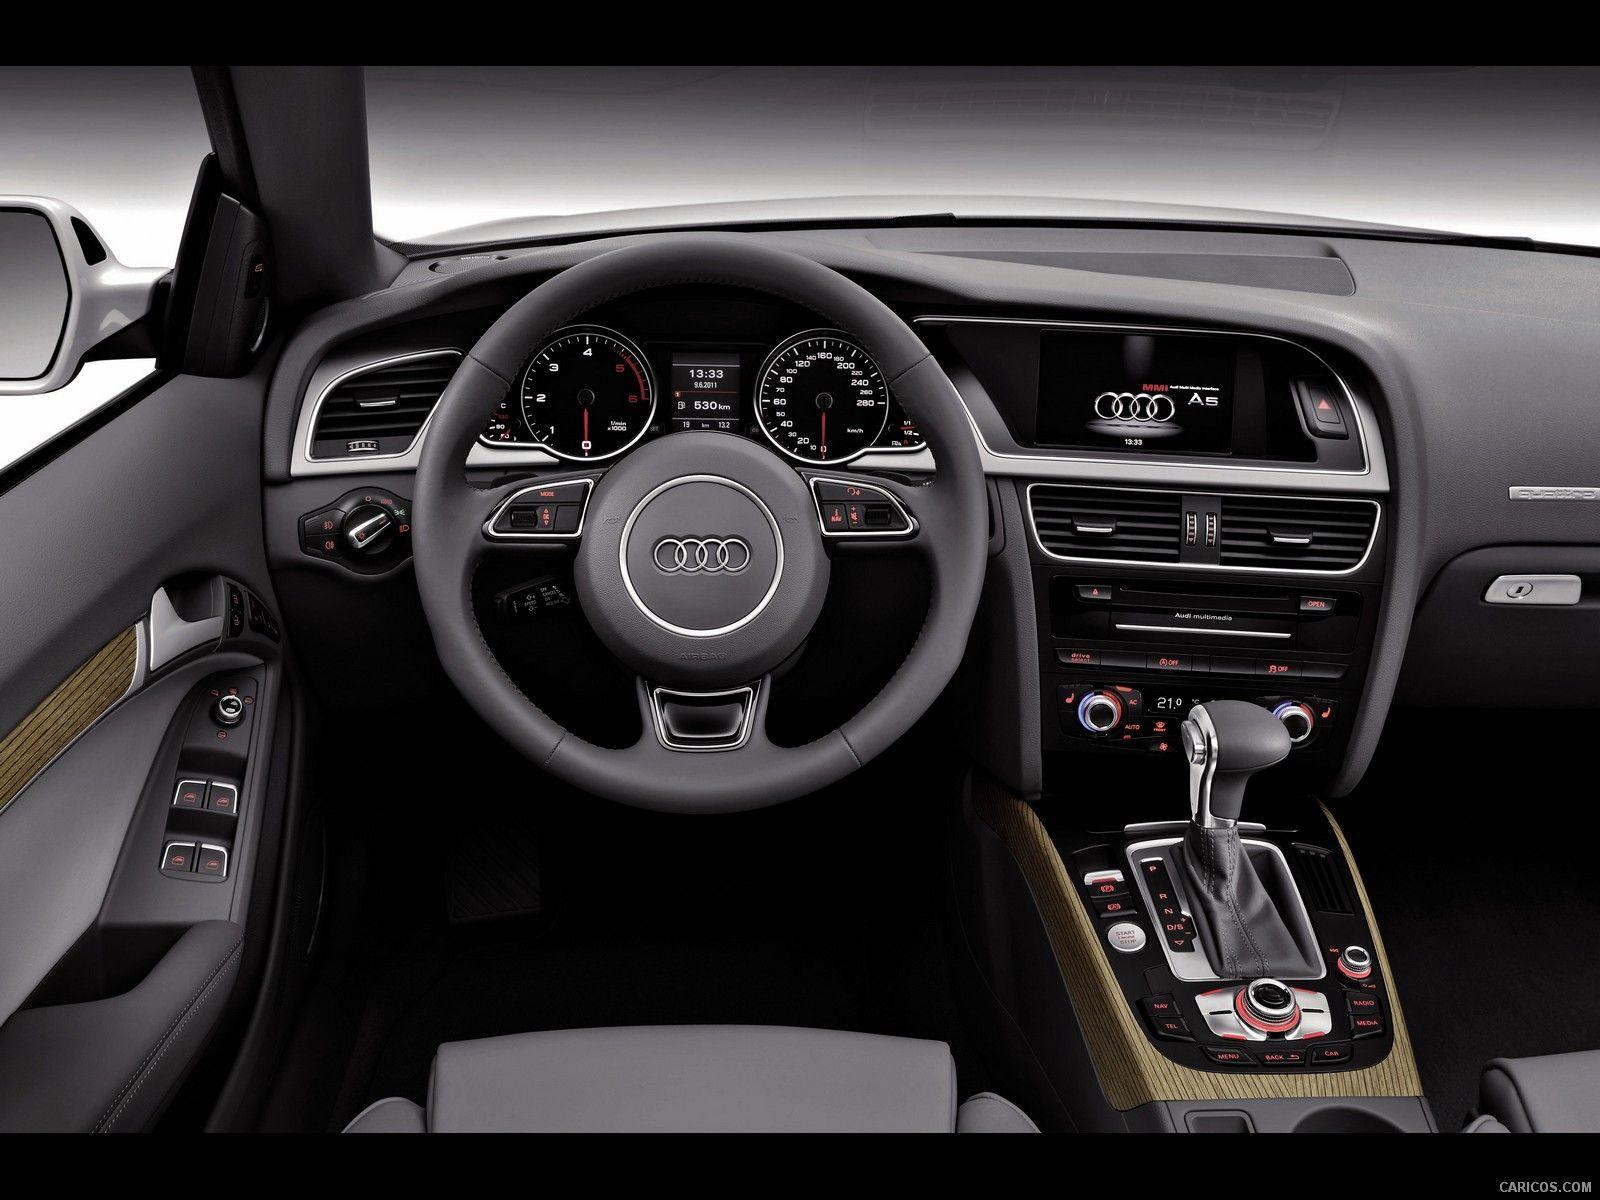 Audi a5 cabriolet 2012 a5 cabriolet cabriolets audi a5